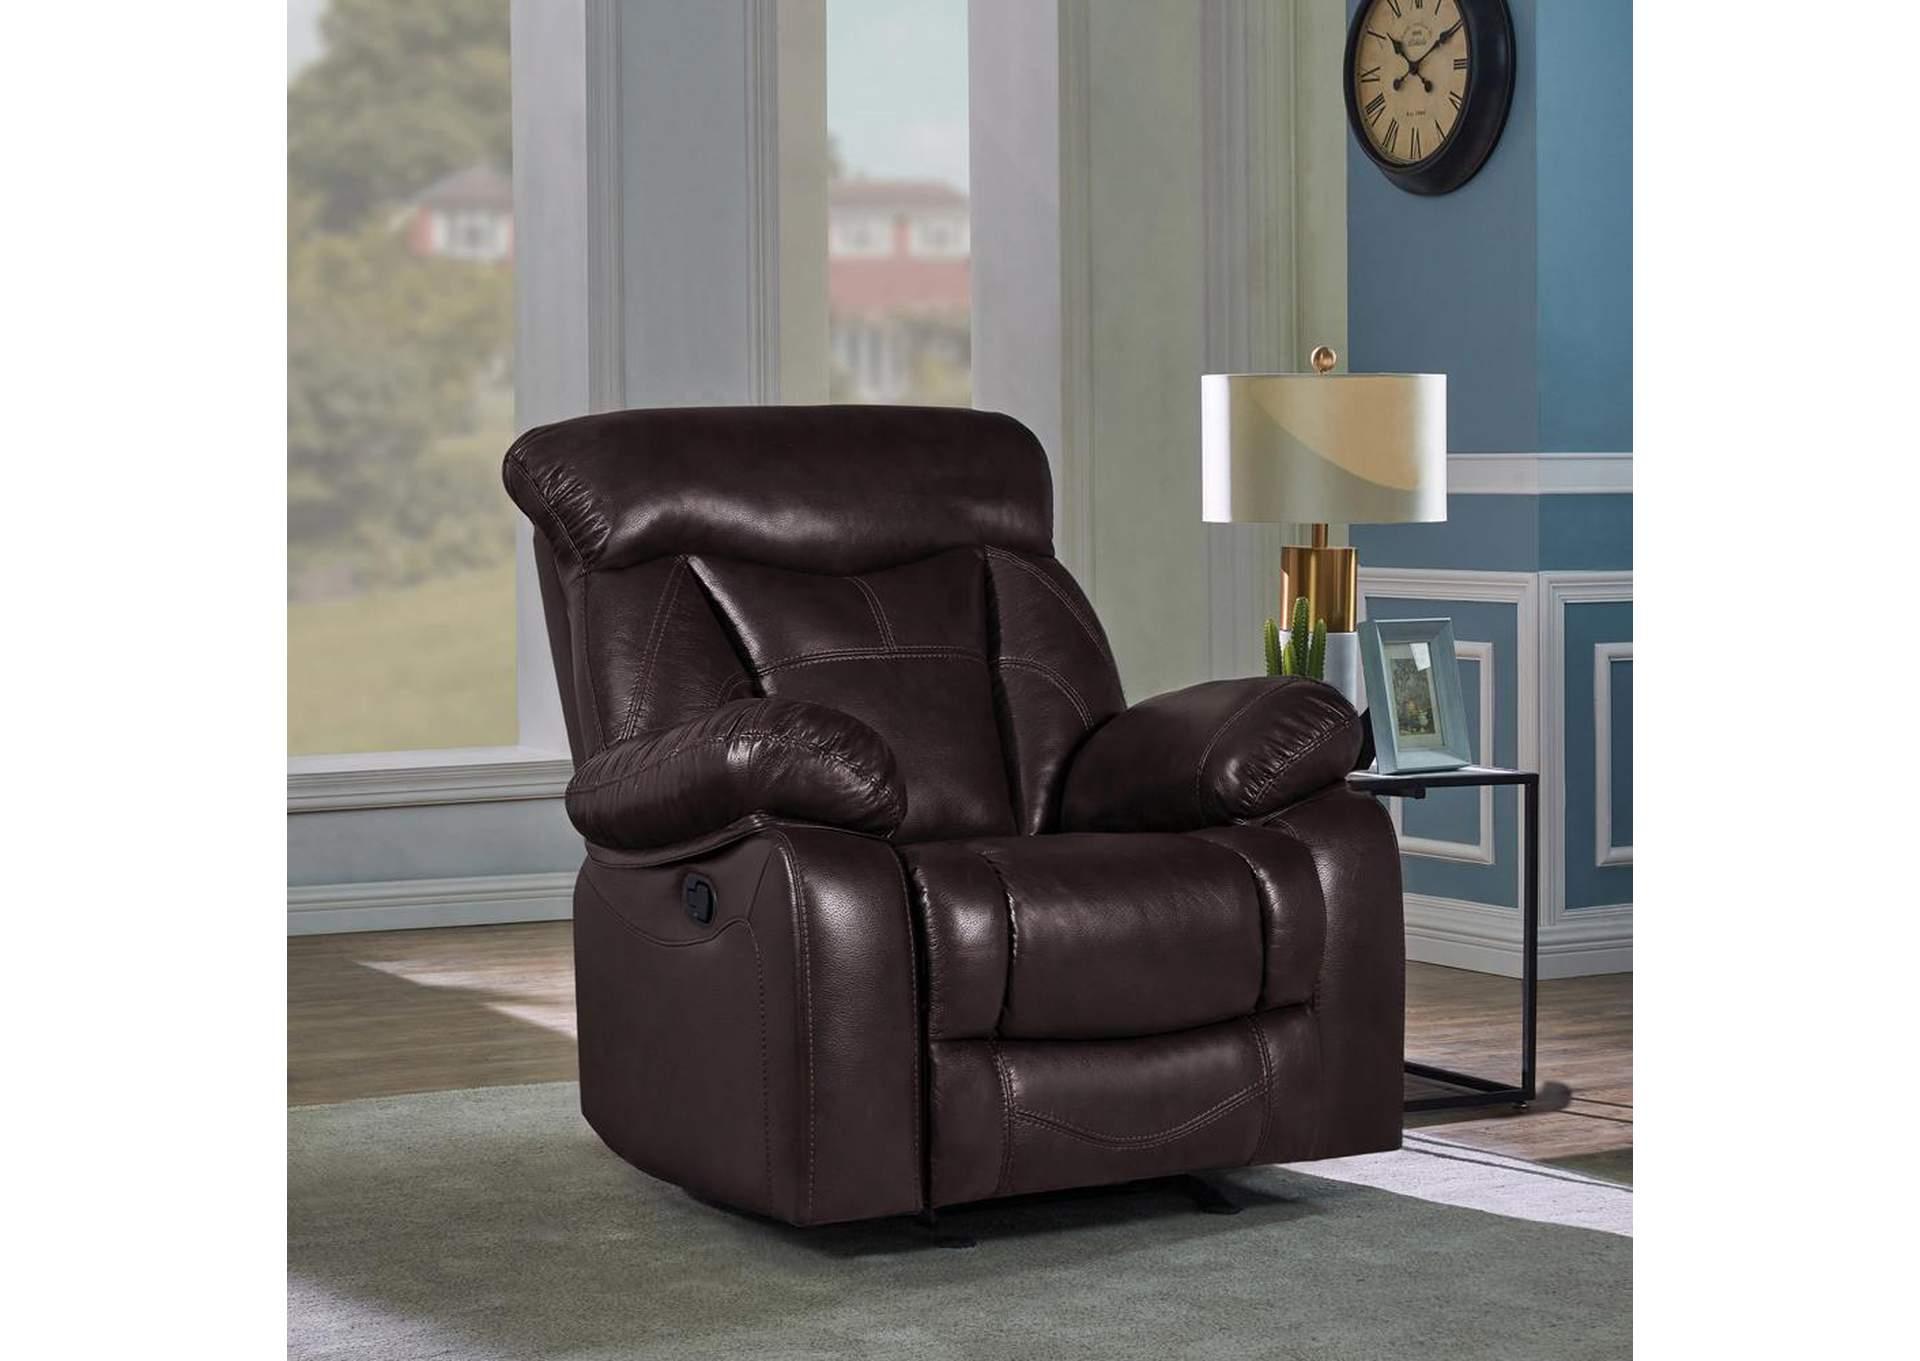 Superieur Recliner,Coaster Furniture